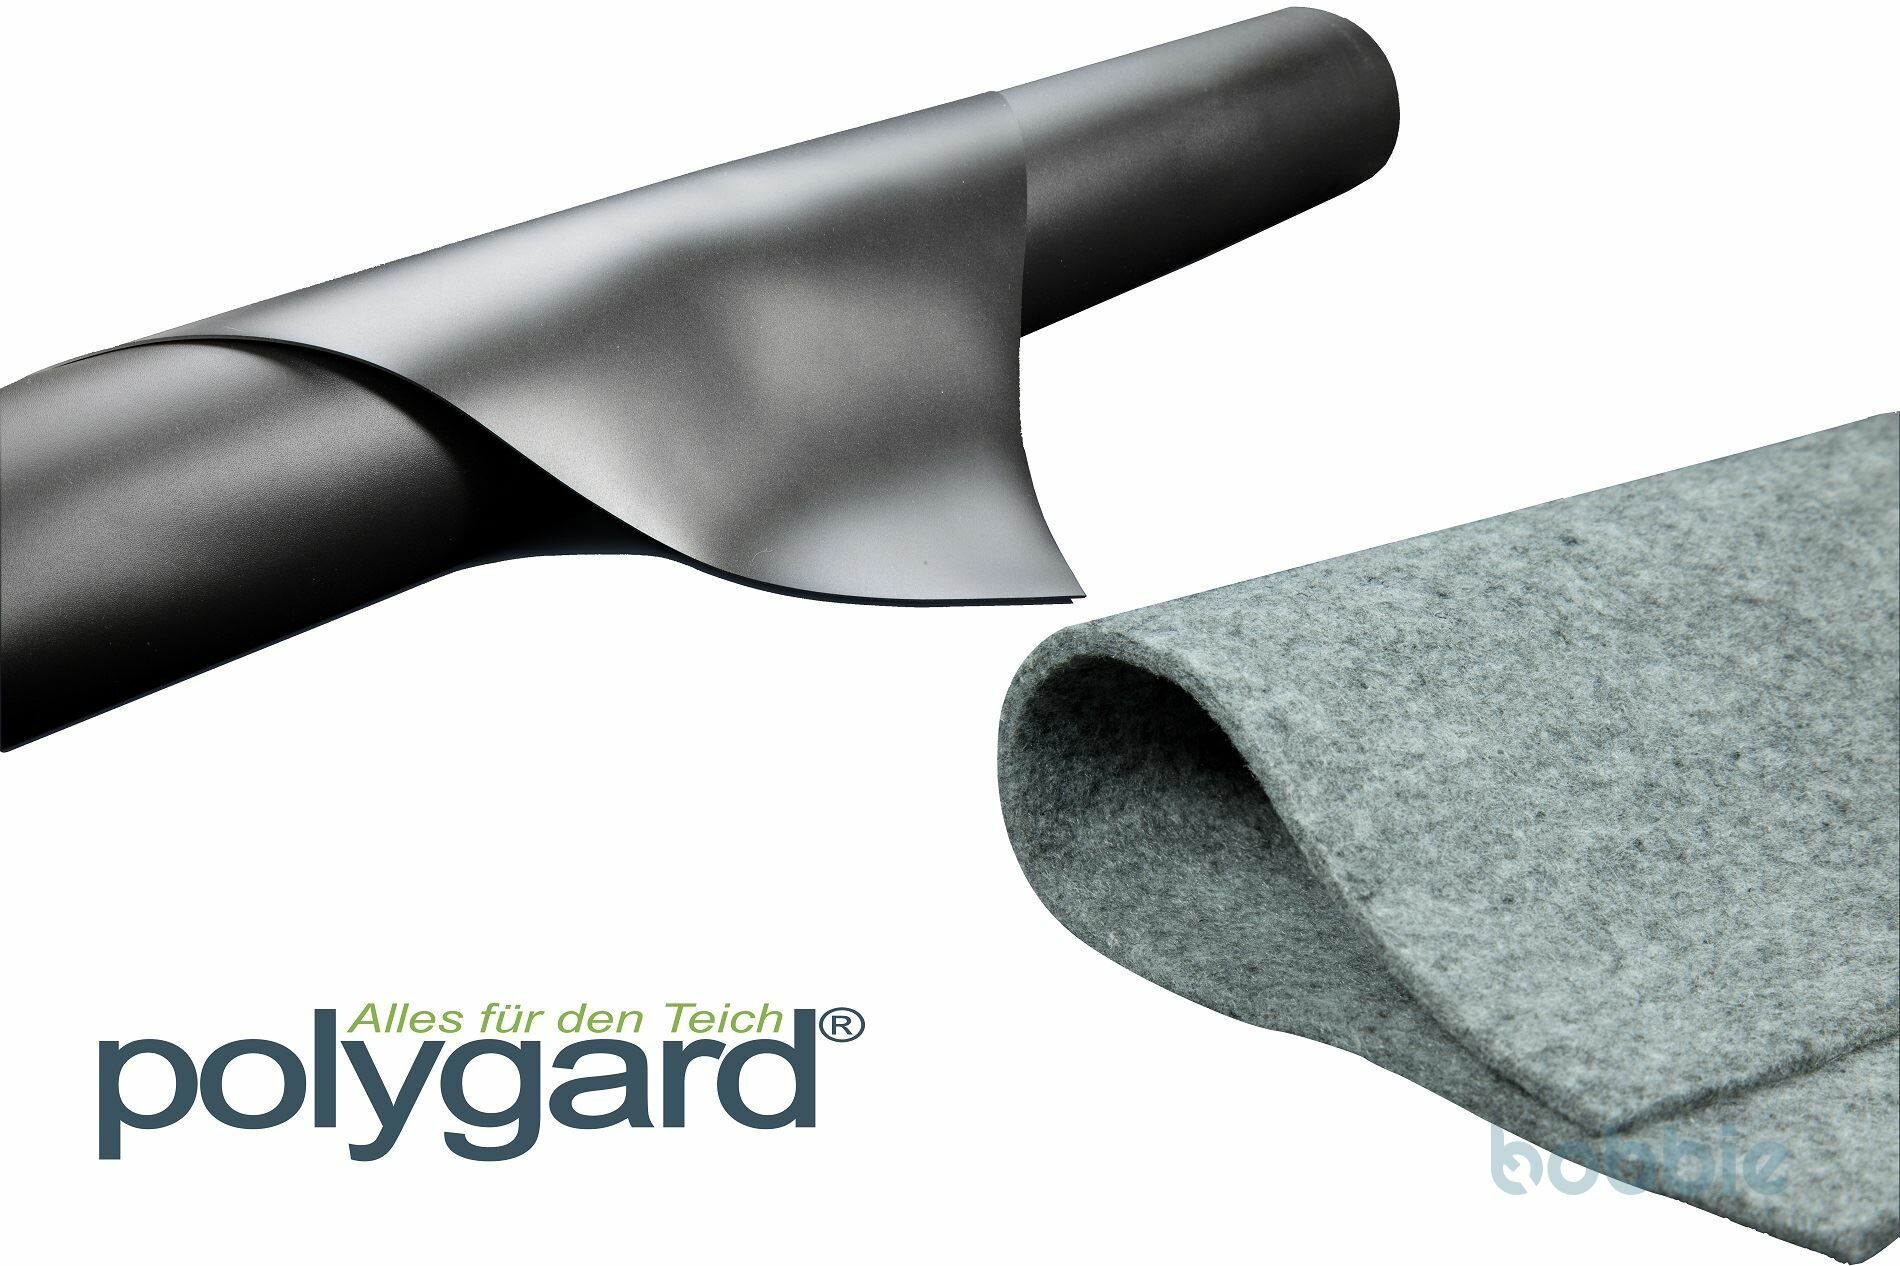 Polygard PVC Teichfolie 1mm schwarz inkl. Vlies 500g/m²